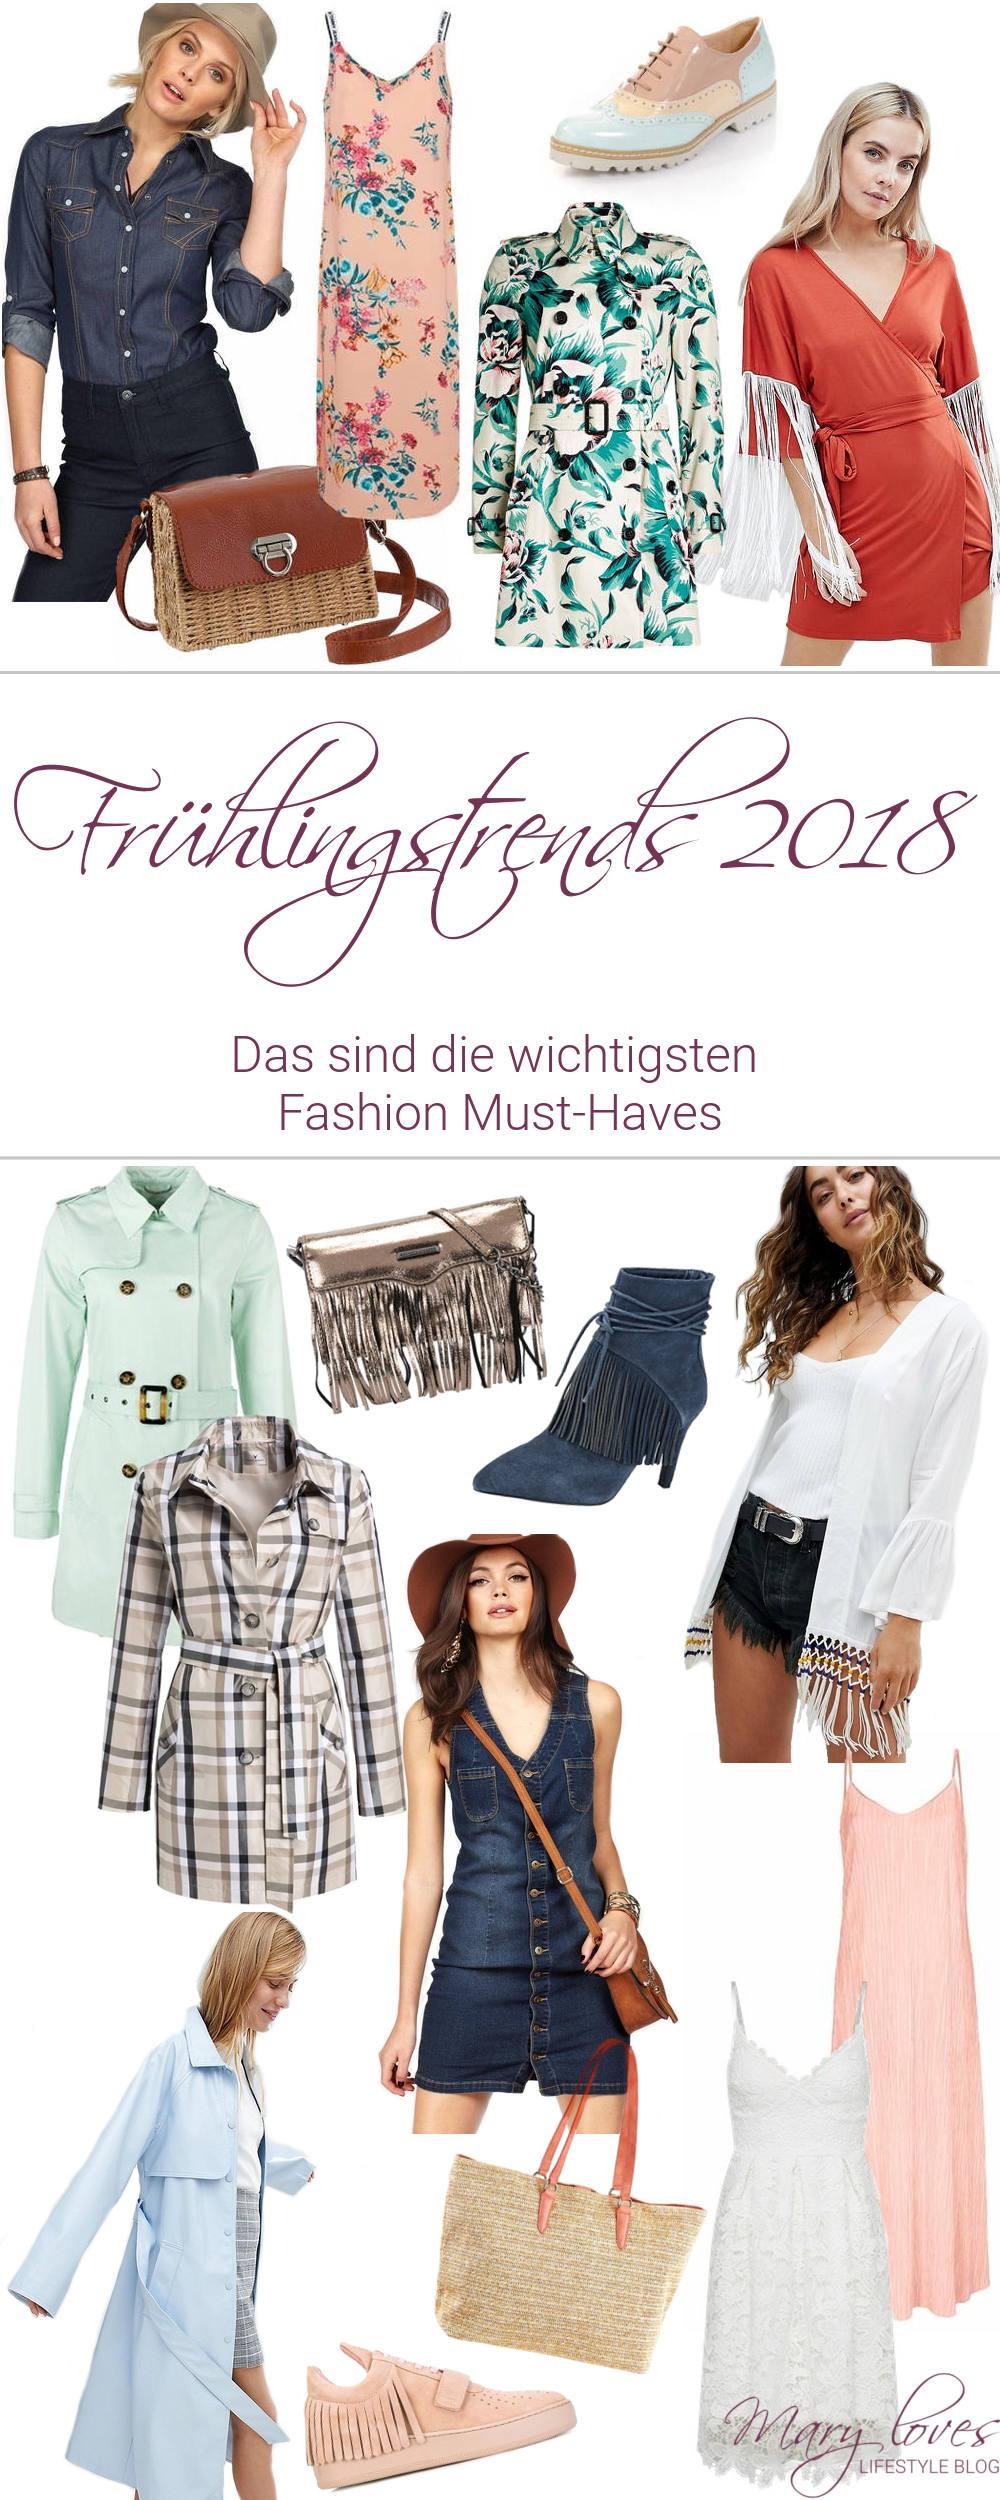 Frühlingstrends 2018 - Das sind die wichtigsten Fashion Must-Haves - #frühlingstrends #trends2018 #modetrends #fashioninspiration #outfitideen #frühlingsmode #fashiontrends #springfashion